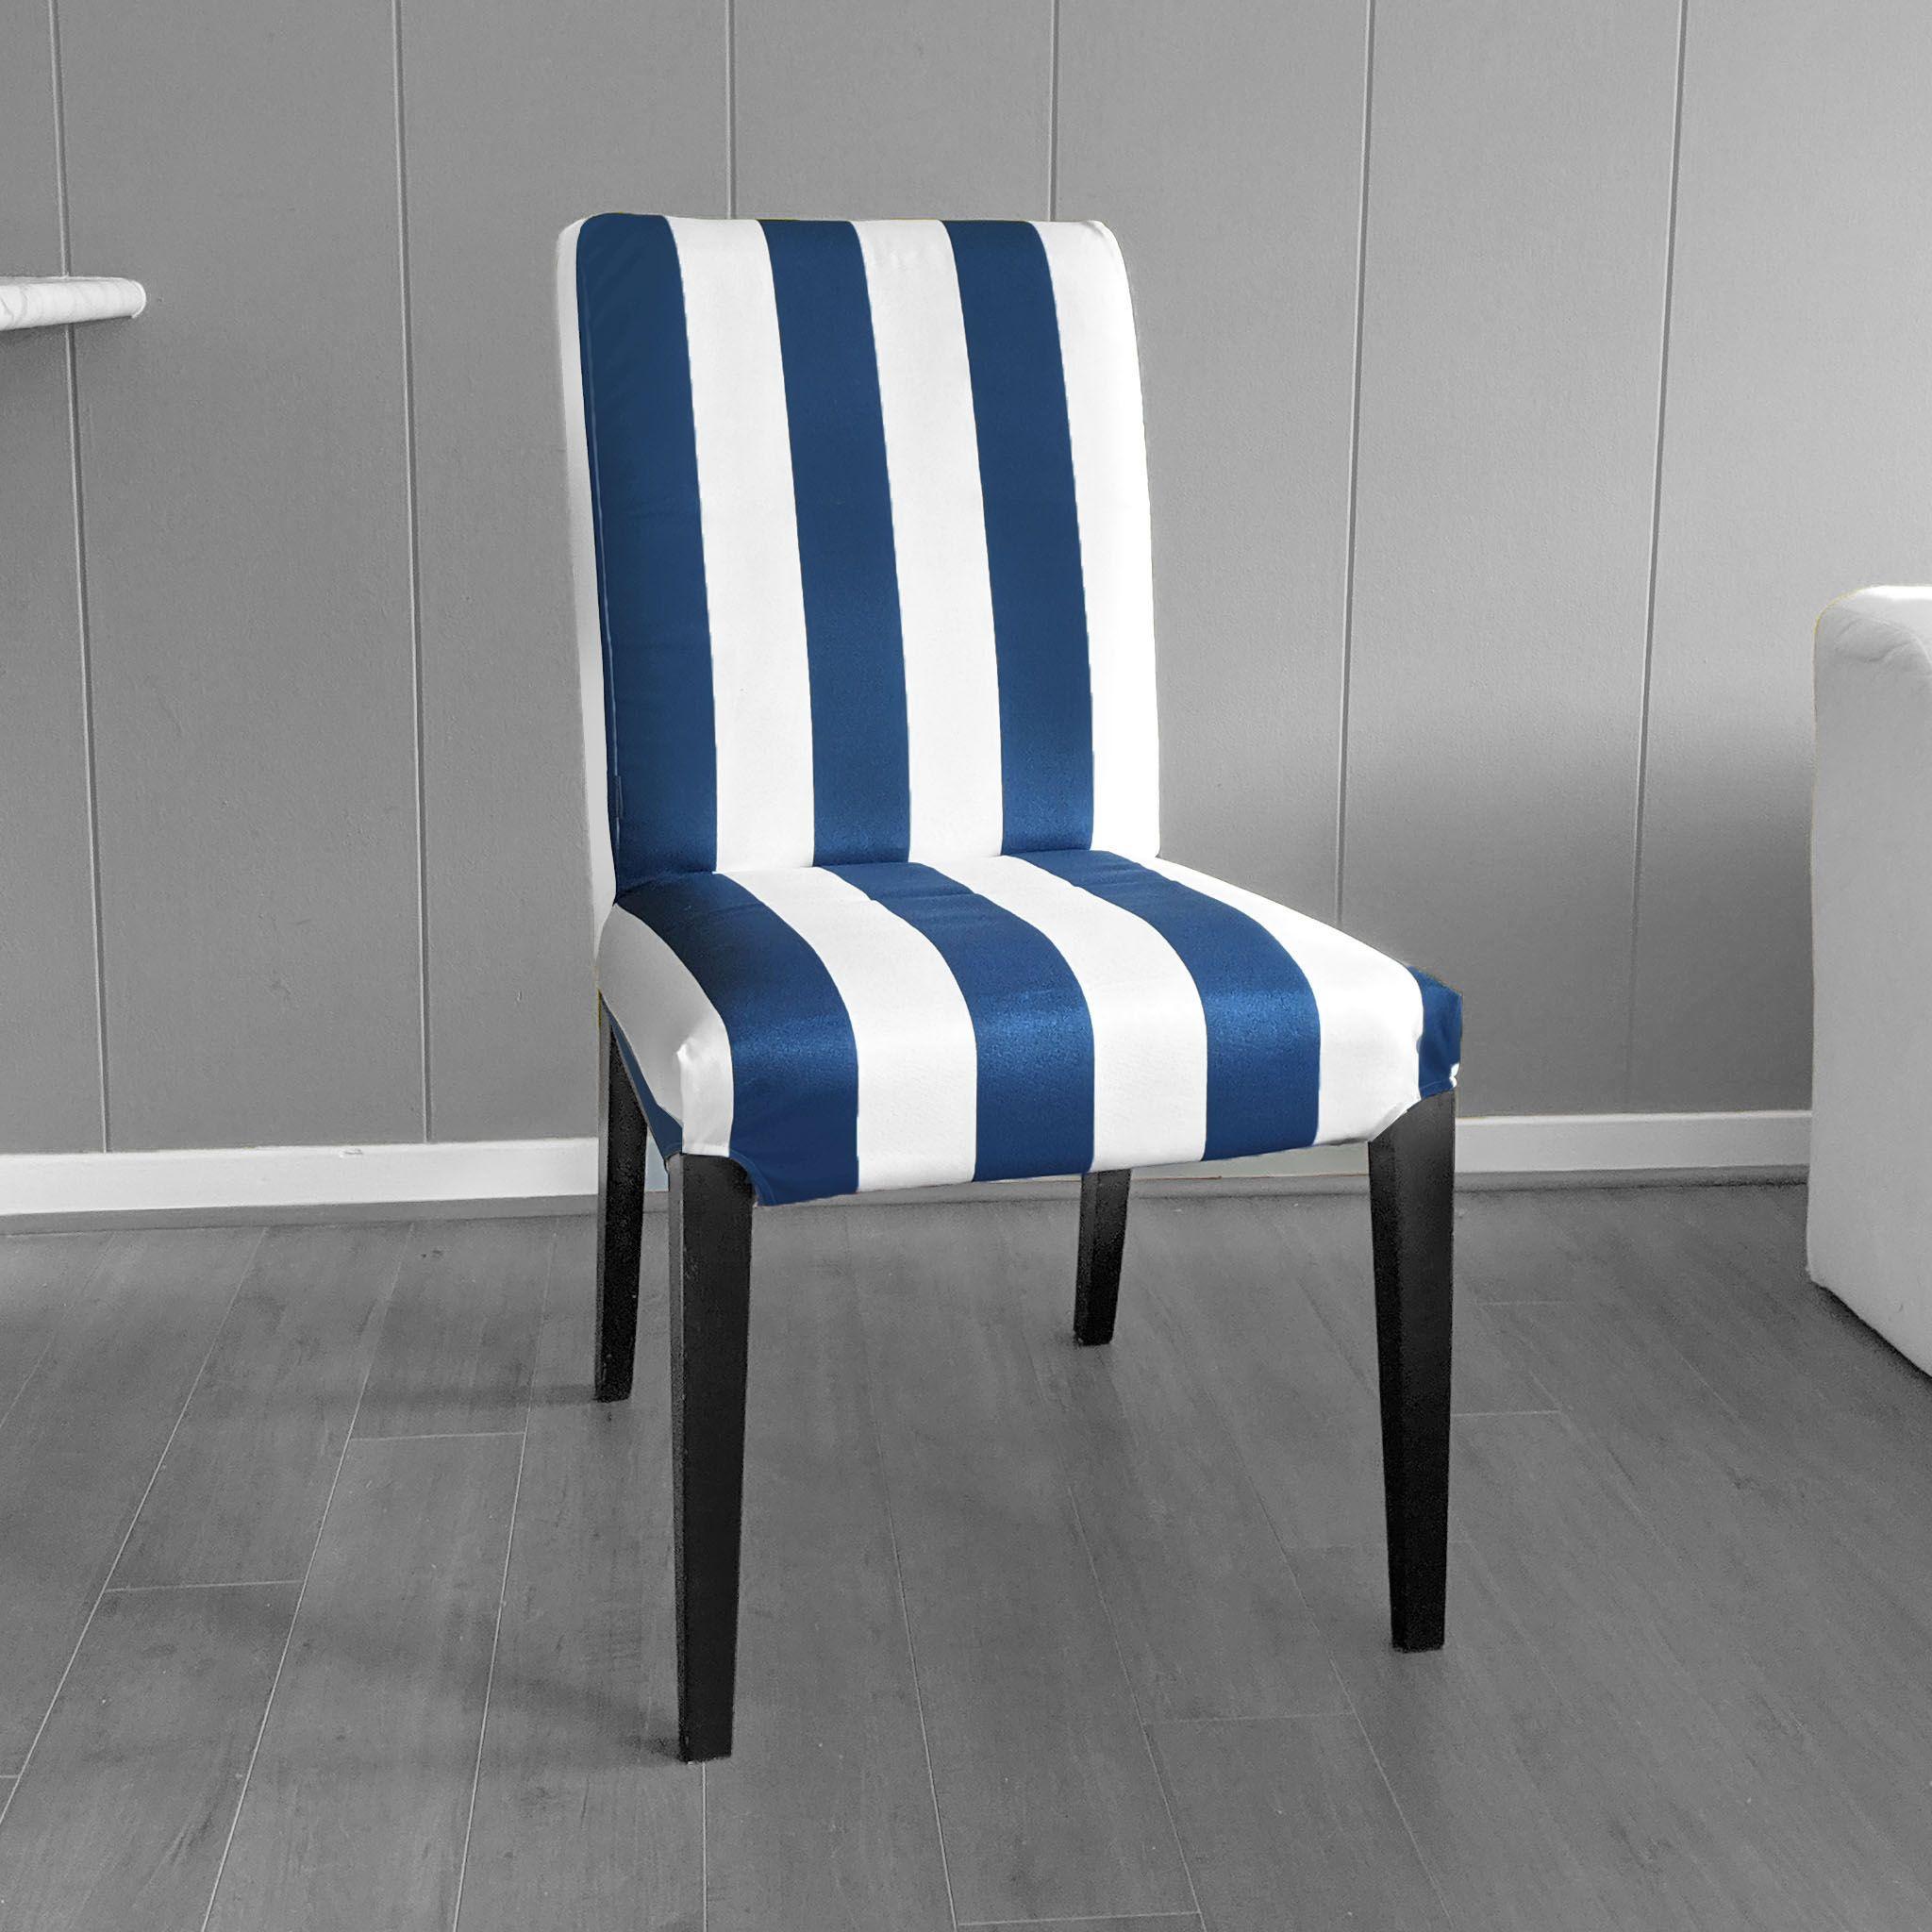 IKEA Henriksdsal Dining Chair Cover, Navy Blue Cabana